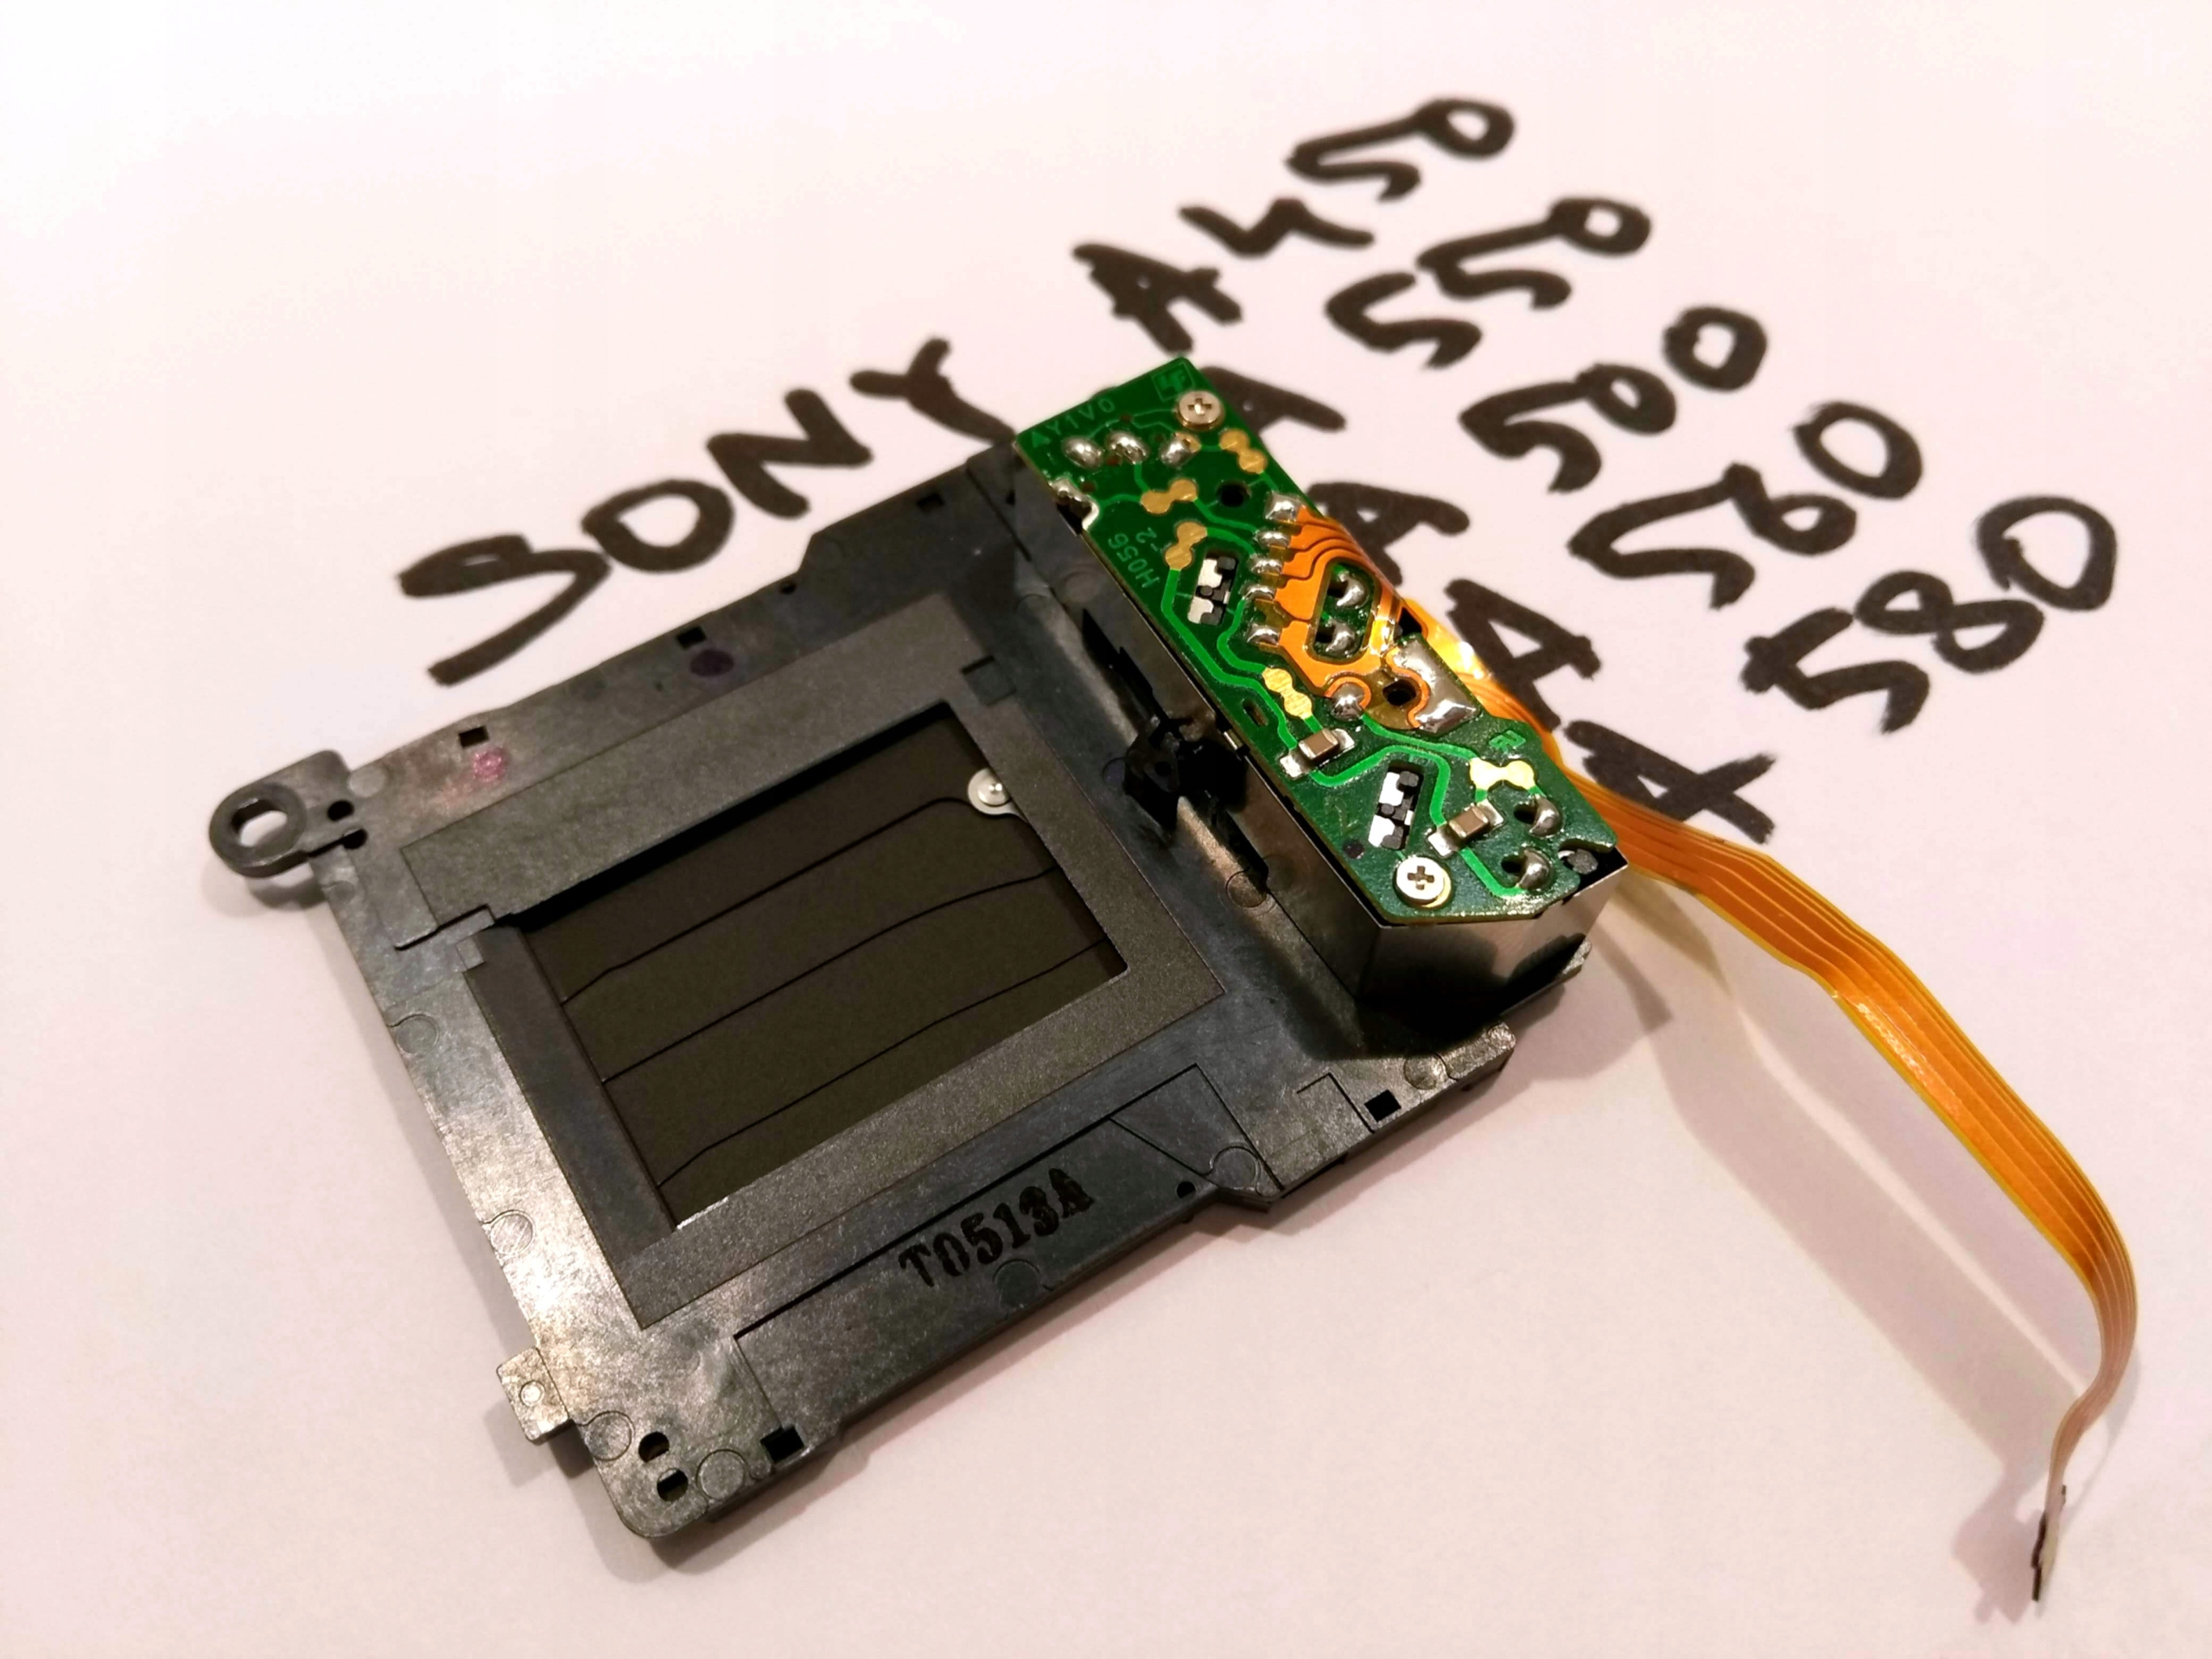 Oryginalna migawka Sony DSLR a450 a550 a560 a580